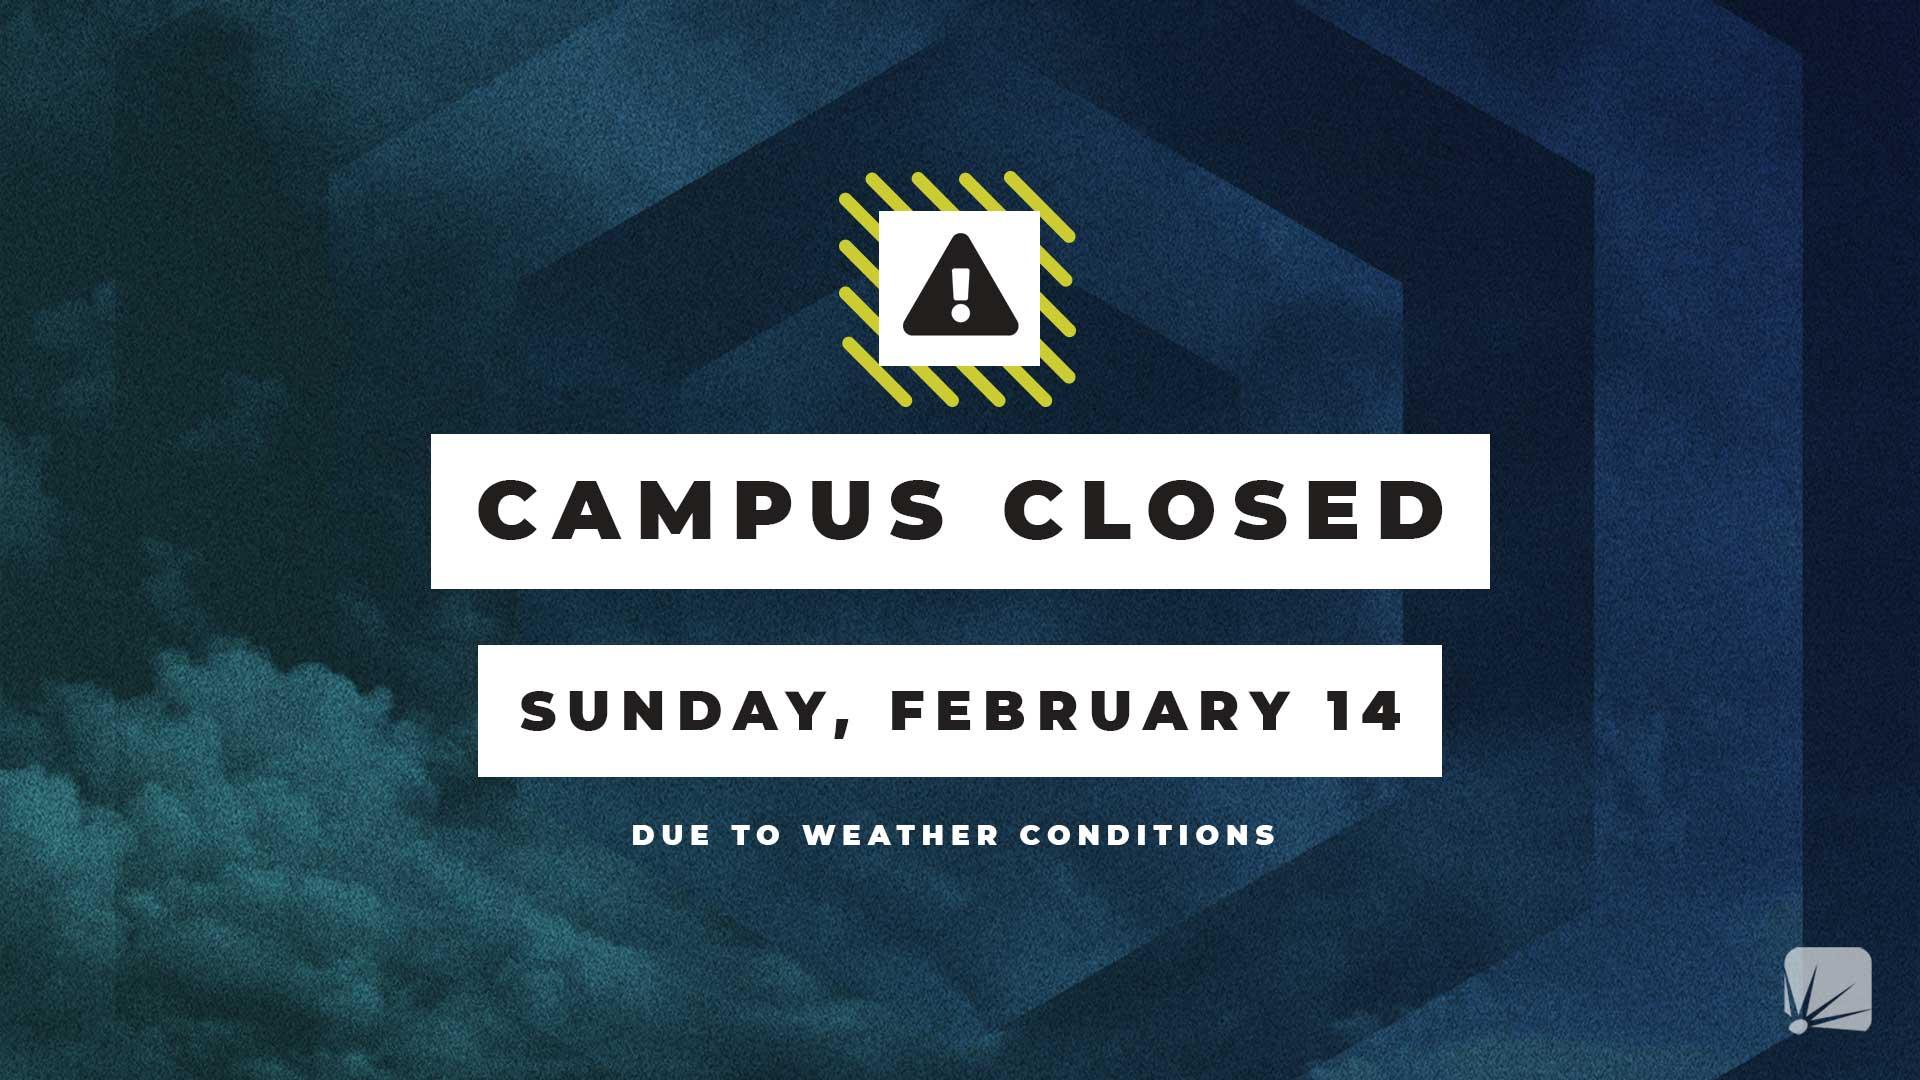 Campus Closed Sunday, February 14